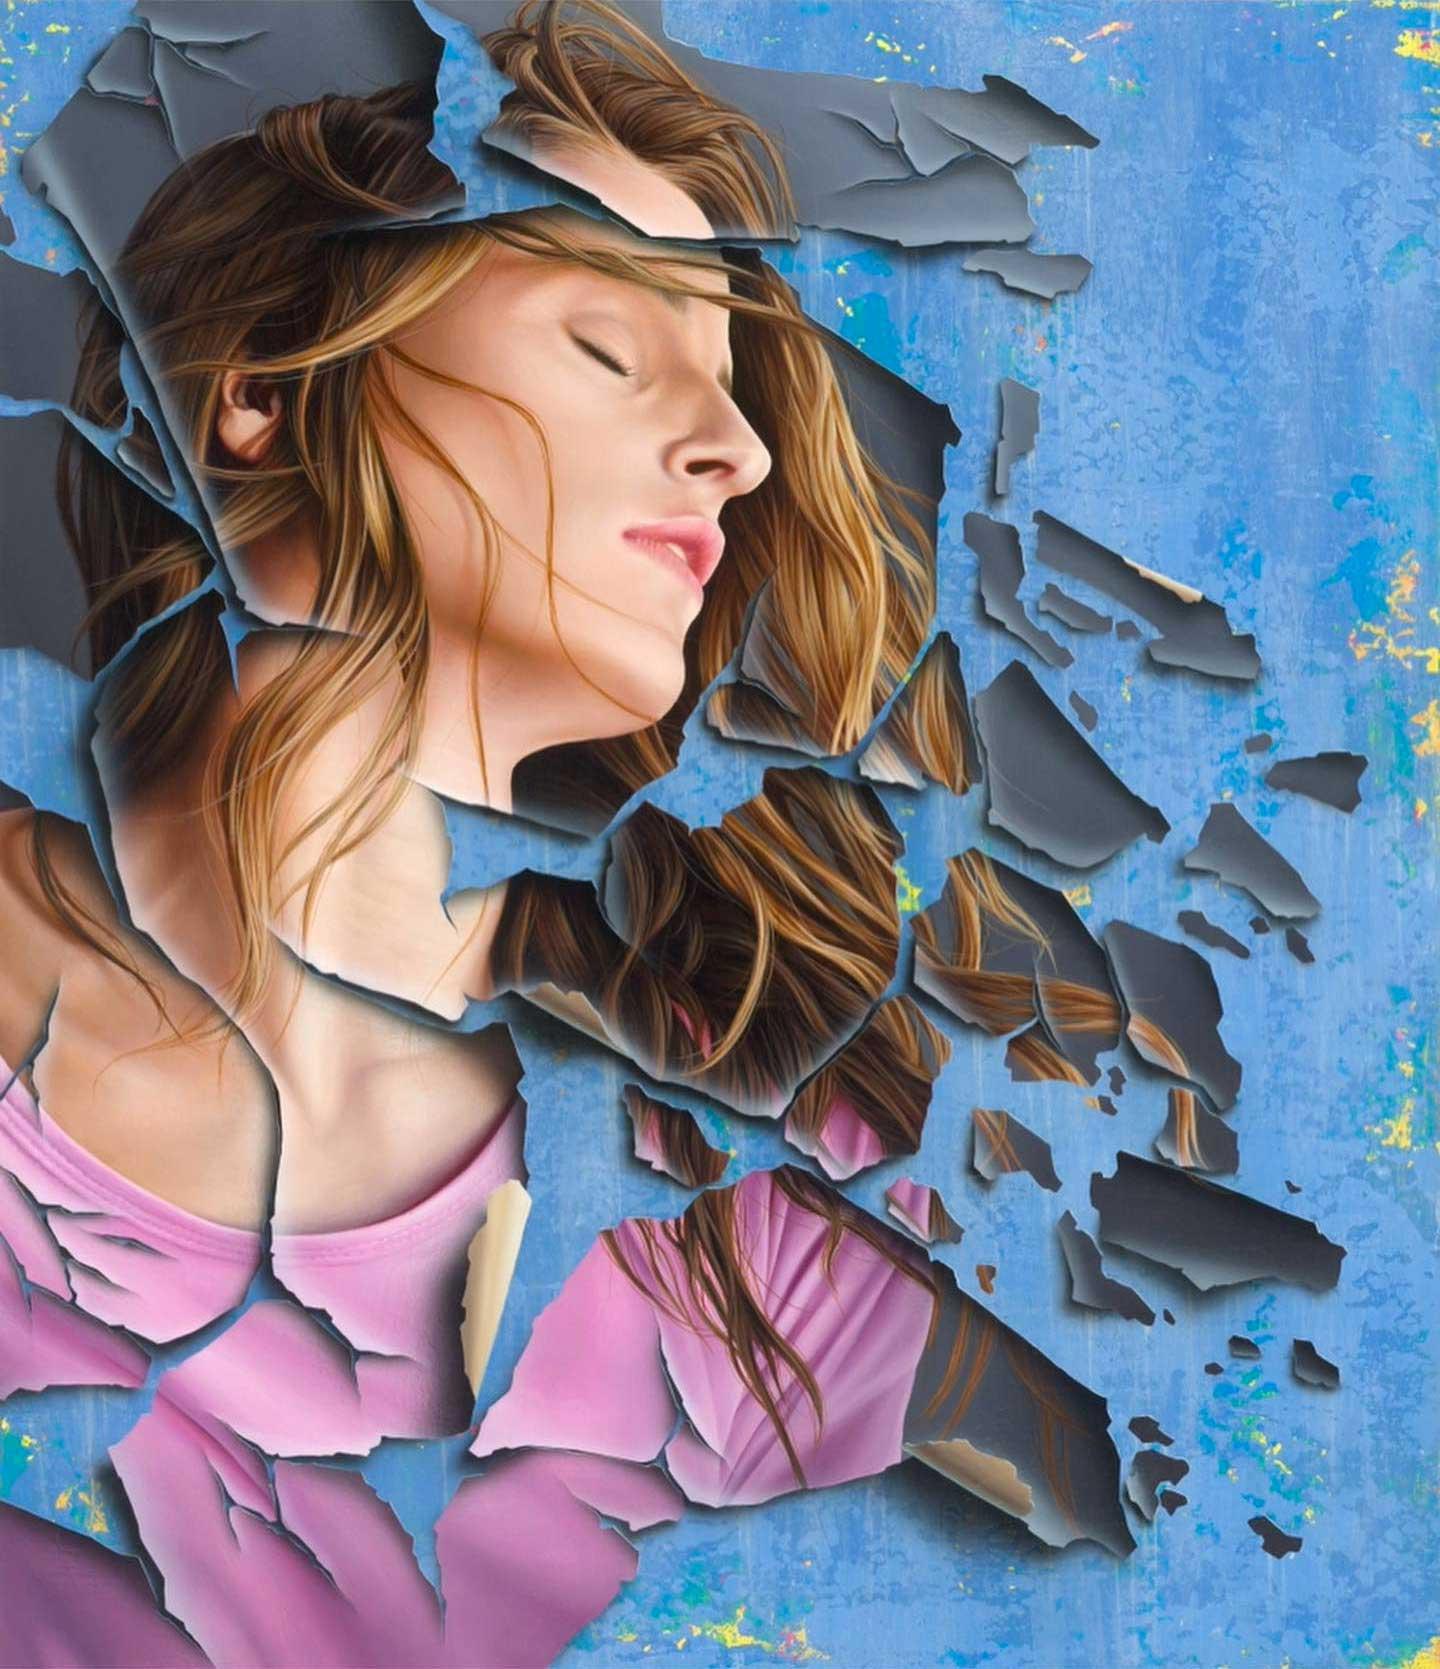 Abgeblätterte Gemälde von James Bullough James-Bullough-2020_03